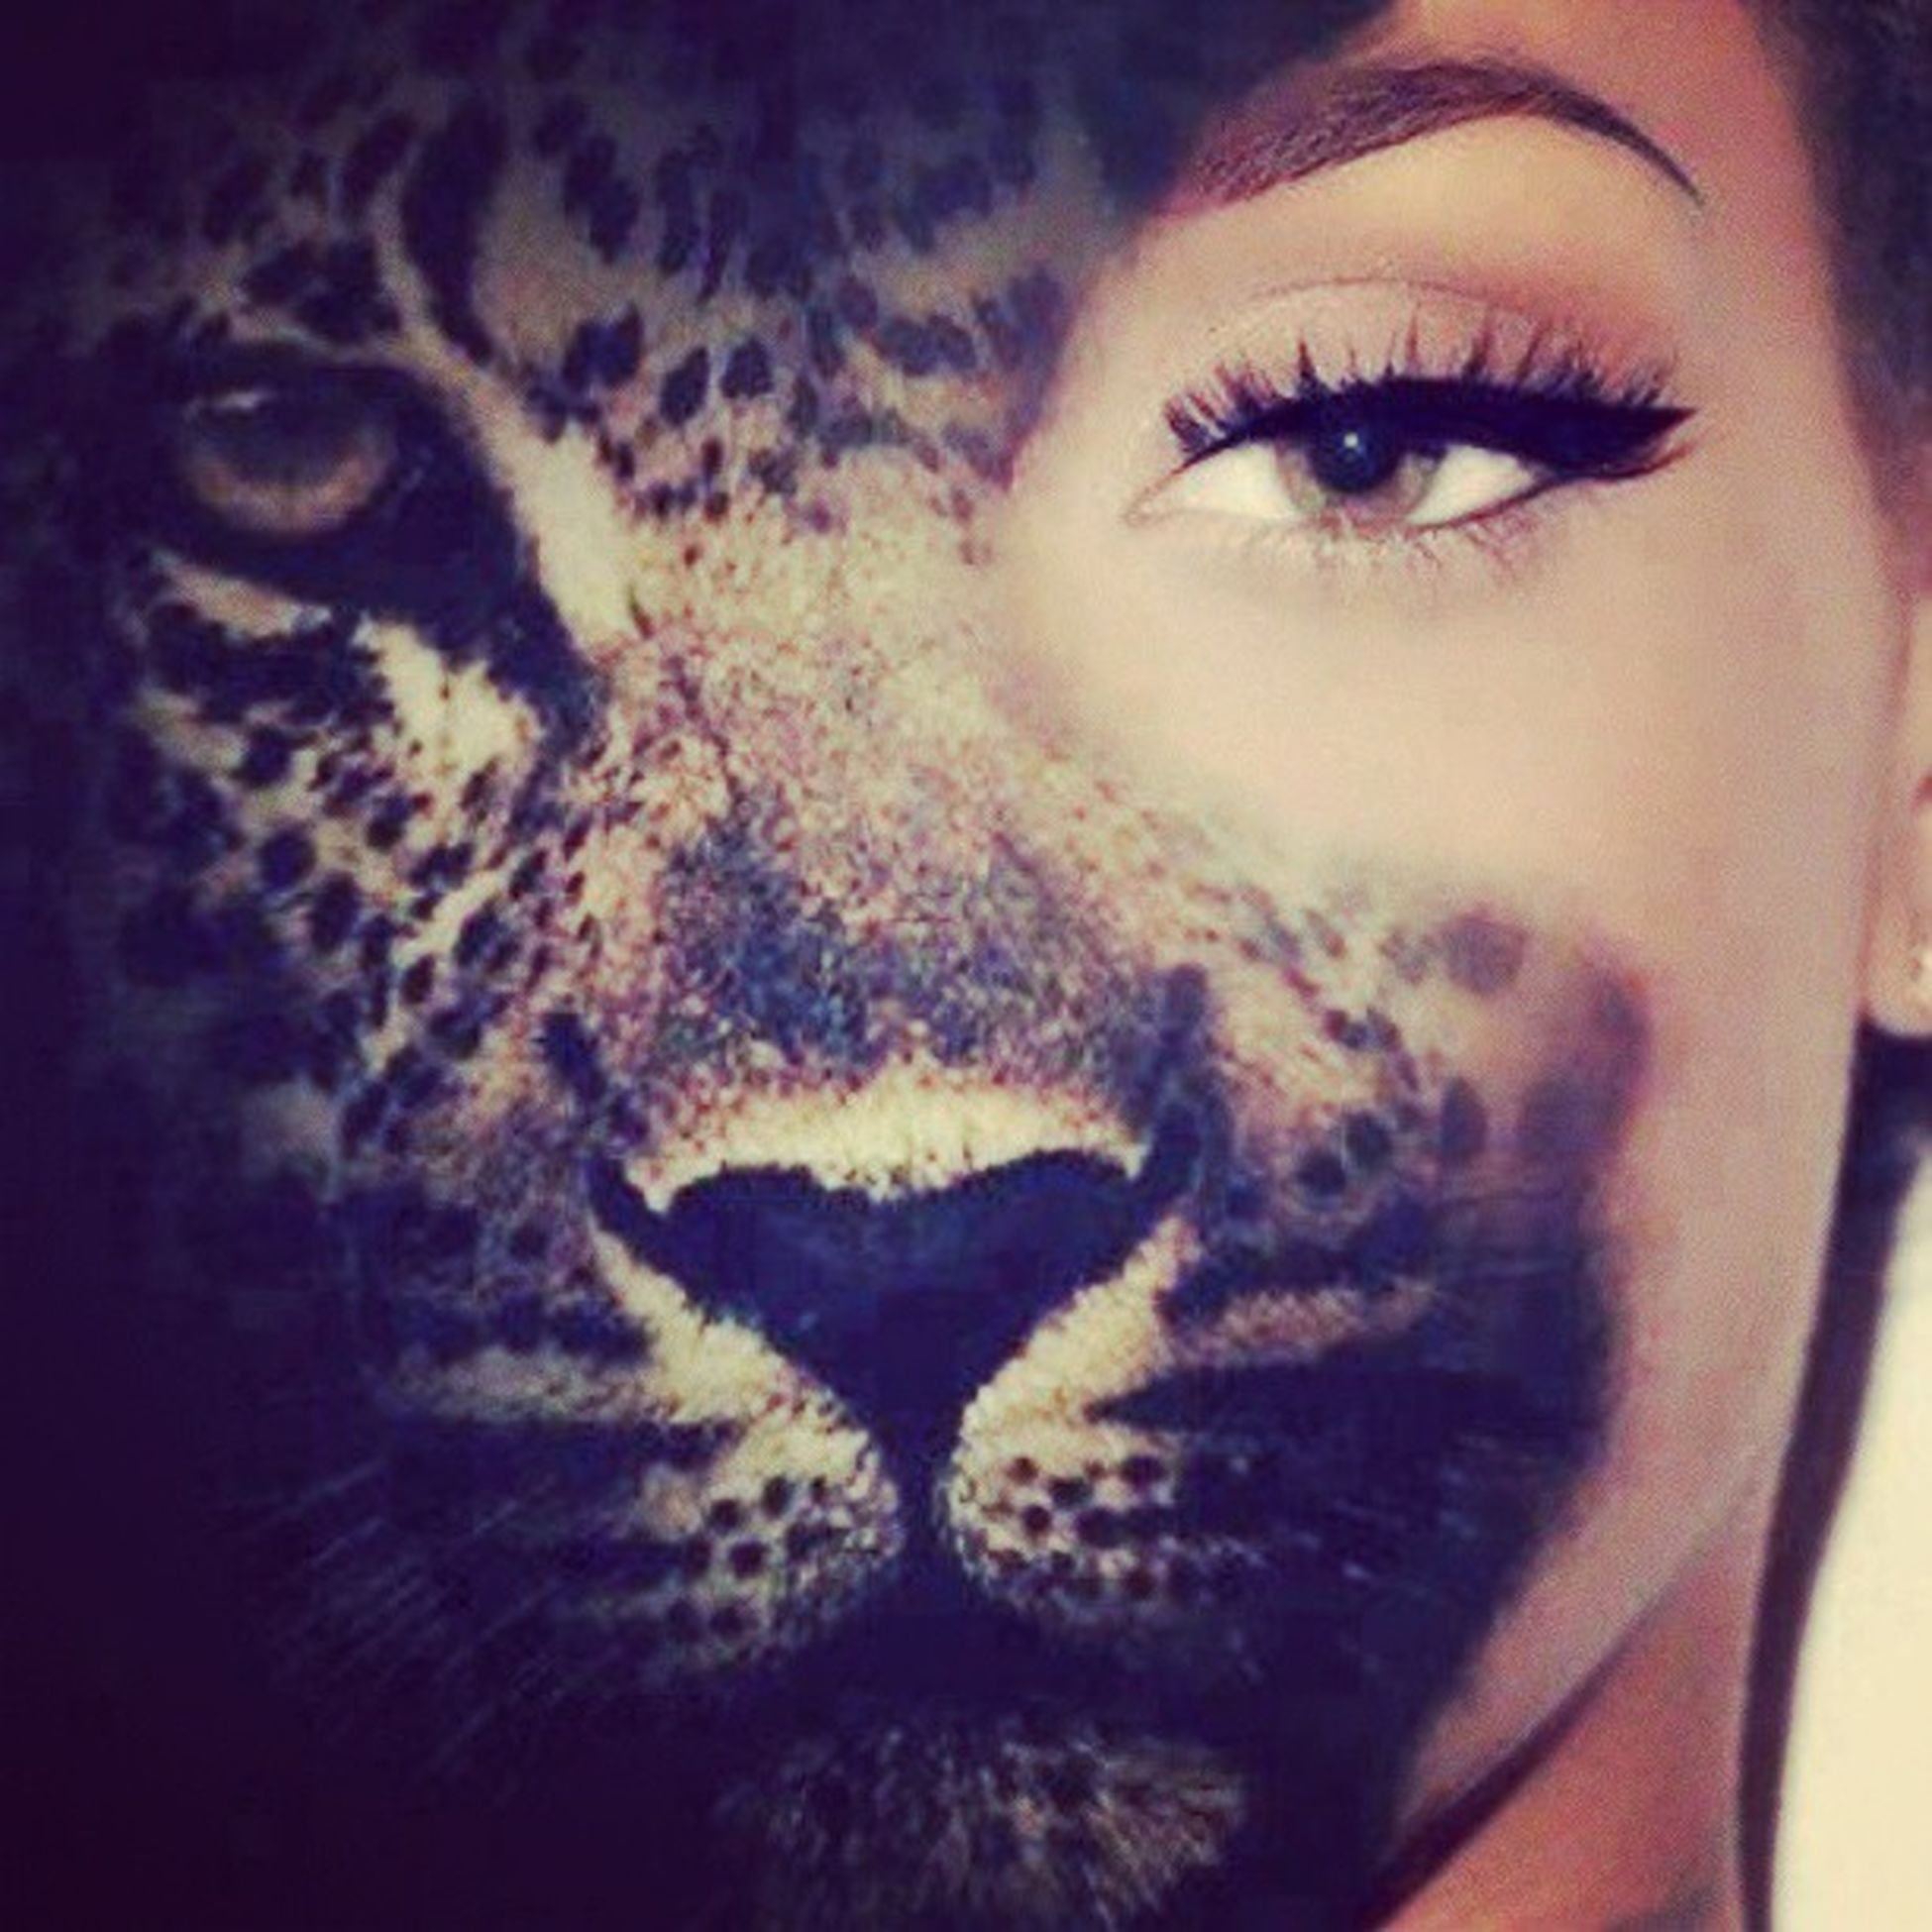 Rahri Rihanna BeautifulWild